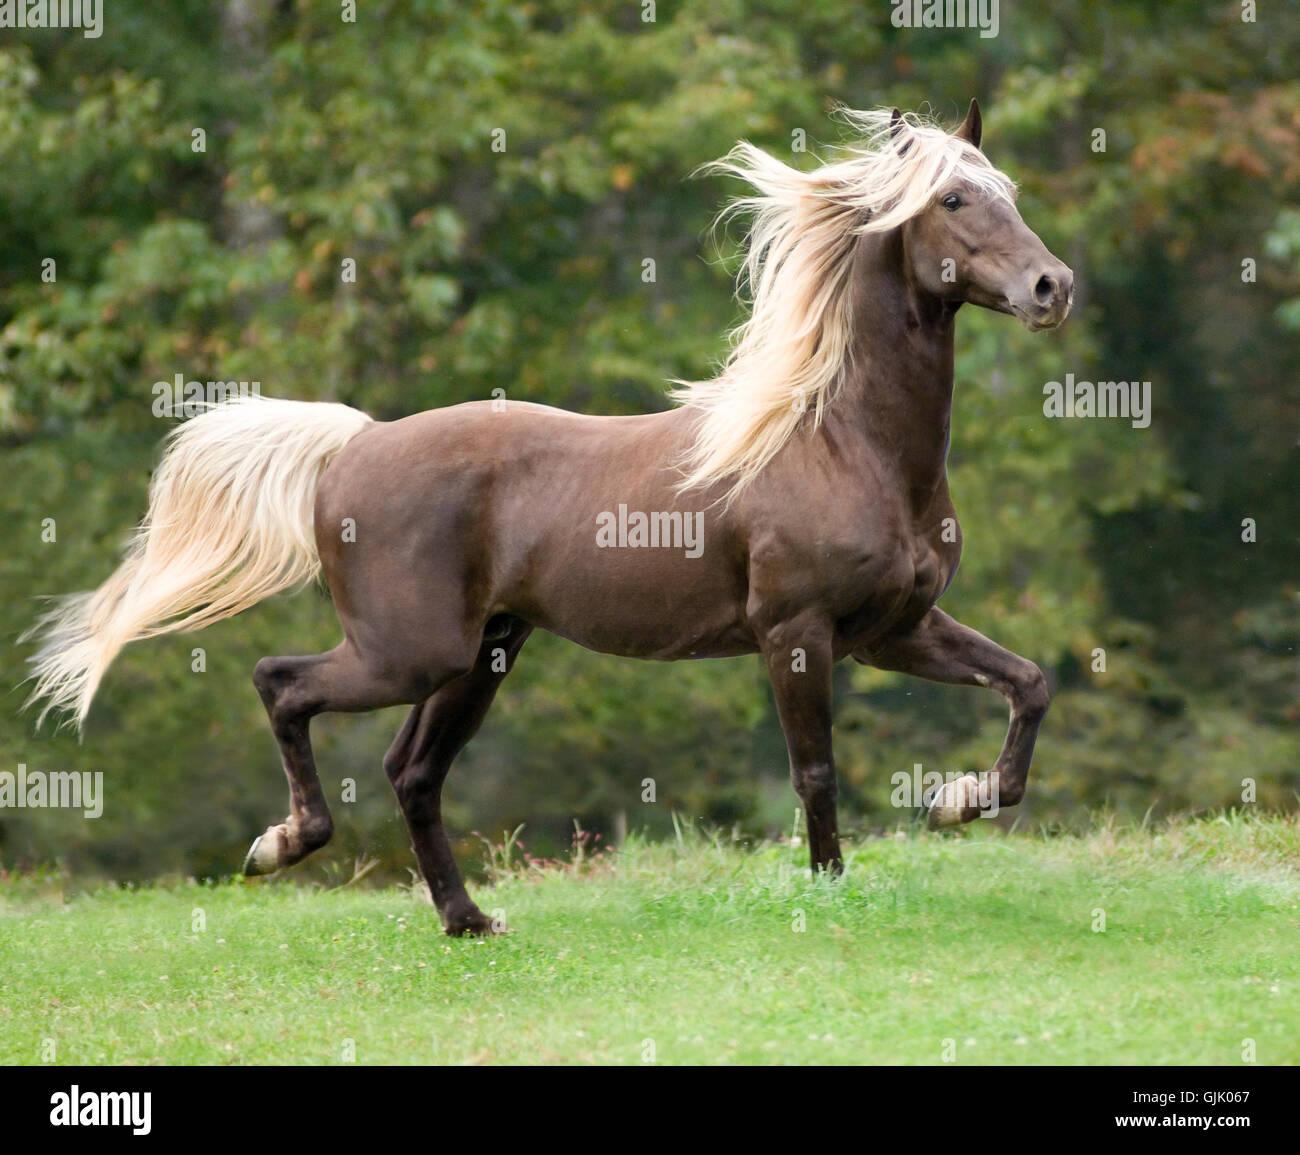 Silver dapple Rocky Mountain Horse stallion trots across open grass paddock - Stock Image